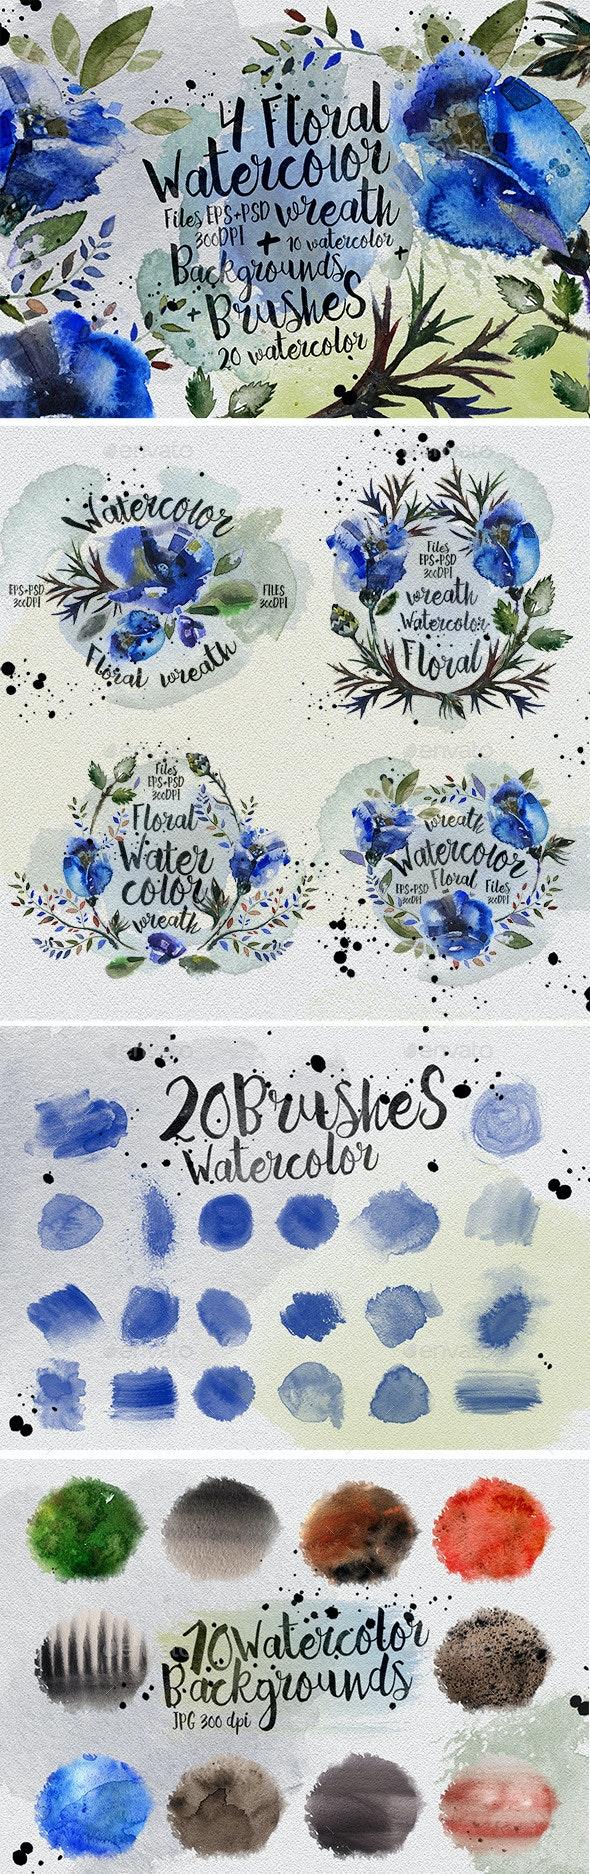 Floral Watercolor Wreaths - Flourishes / Swirls Decorative